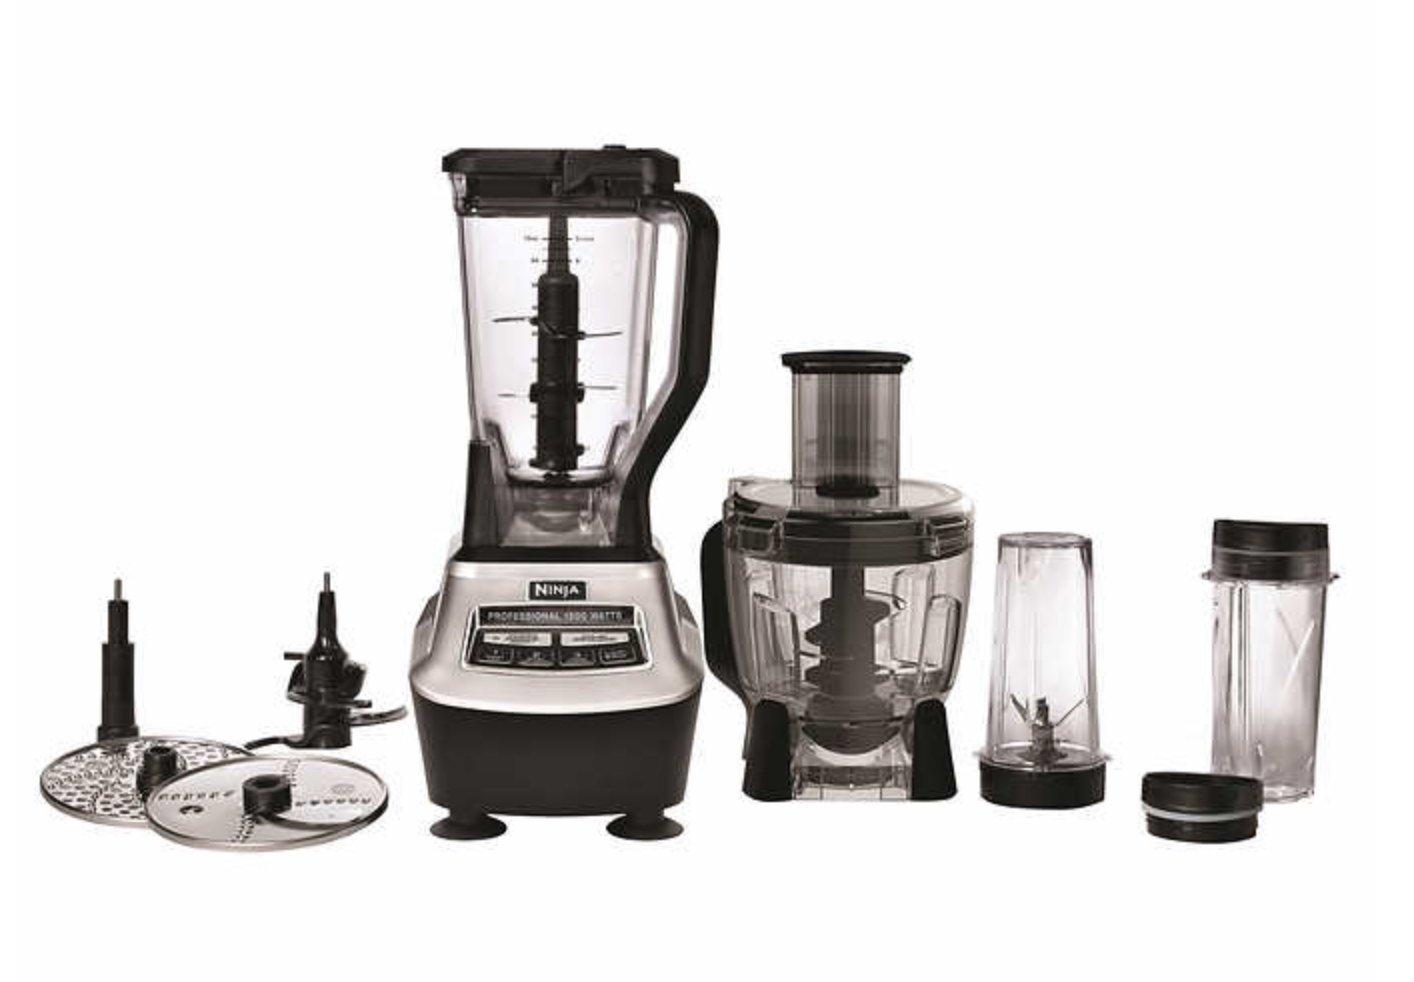 Amazon.com: Ninja Mega Kitchen System (BL773CO): Kitchen & Dining